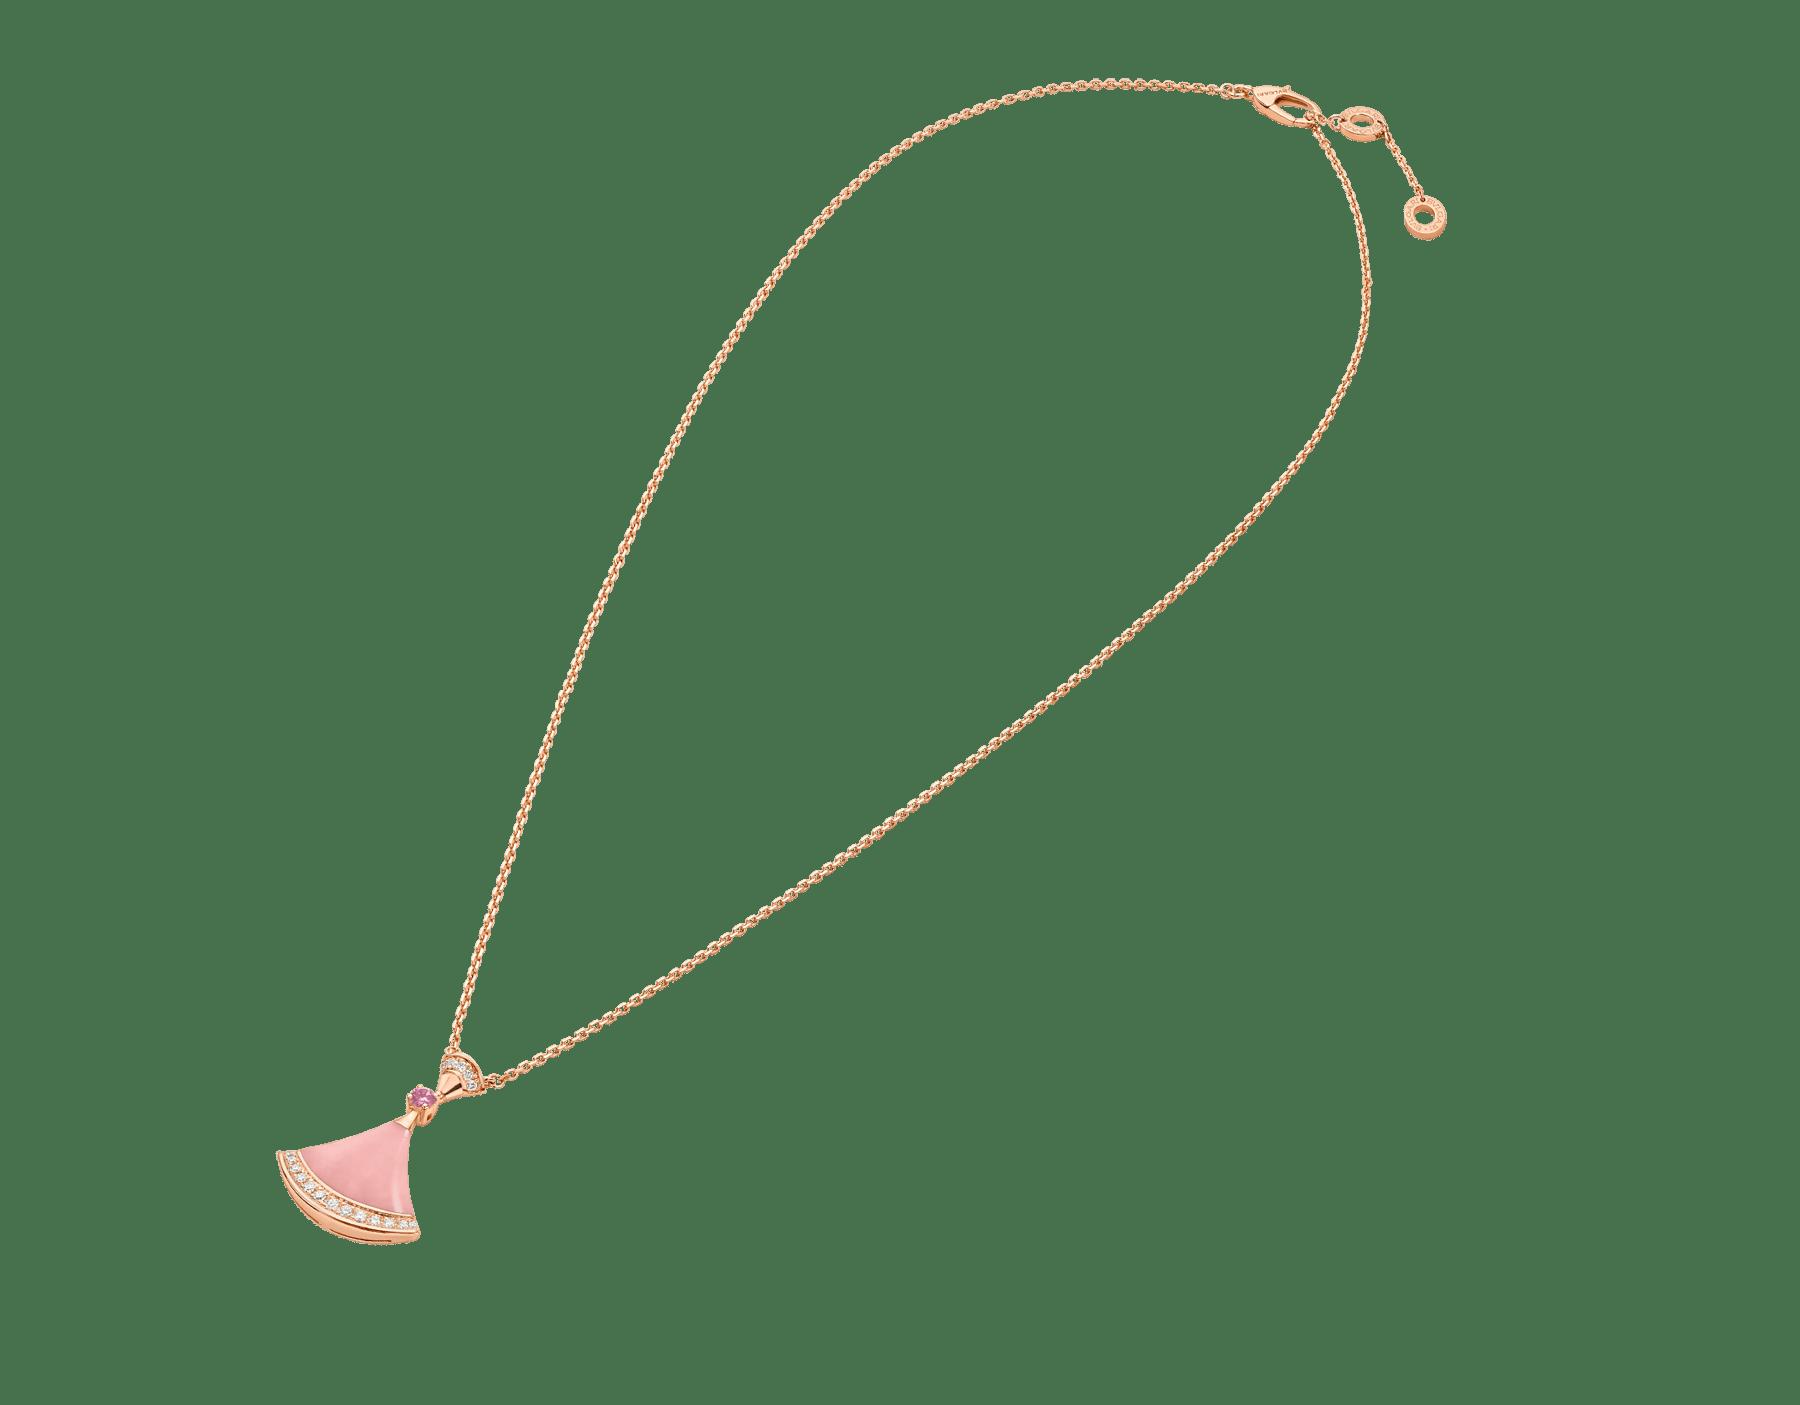 DIVAS' DREAM 18K 玫瑰金項鍊,項墜鑲飾粉紅色蛋白石和 1 顆粉紅色藍寶石,並綴以密鑲鑽石。七夕情人節特別版項鍊。 358131 image 2